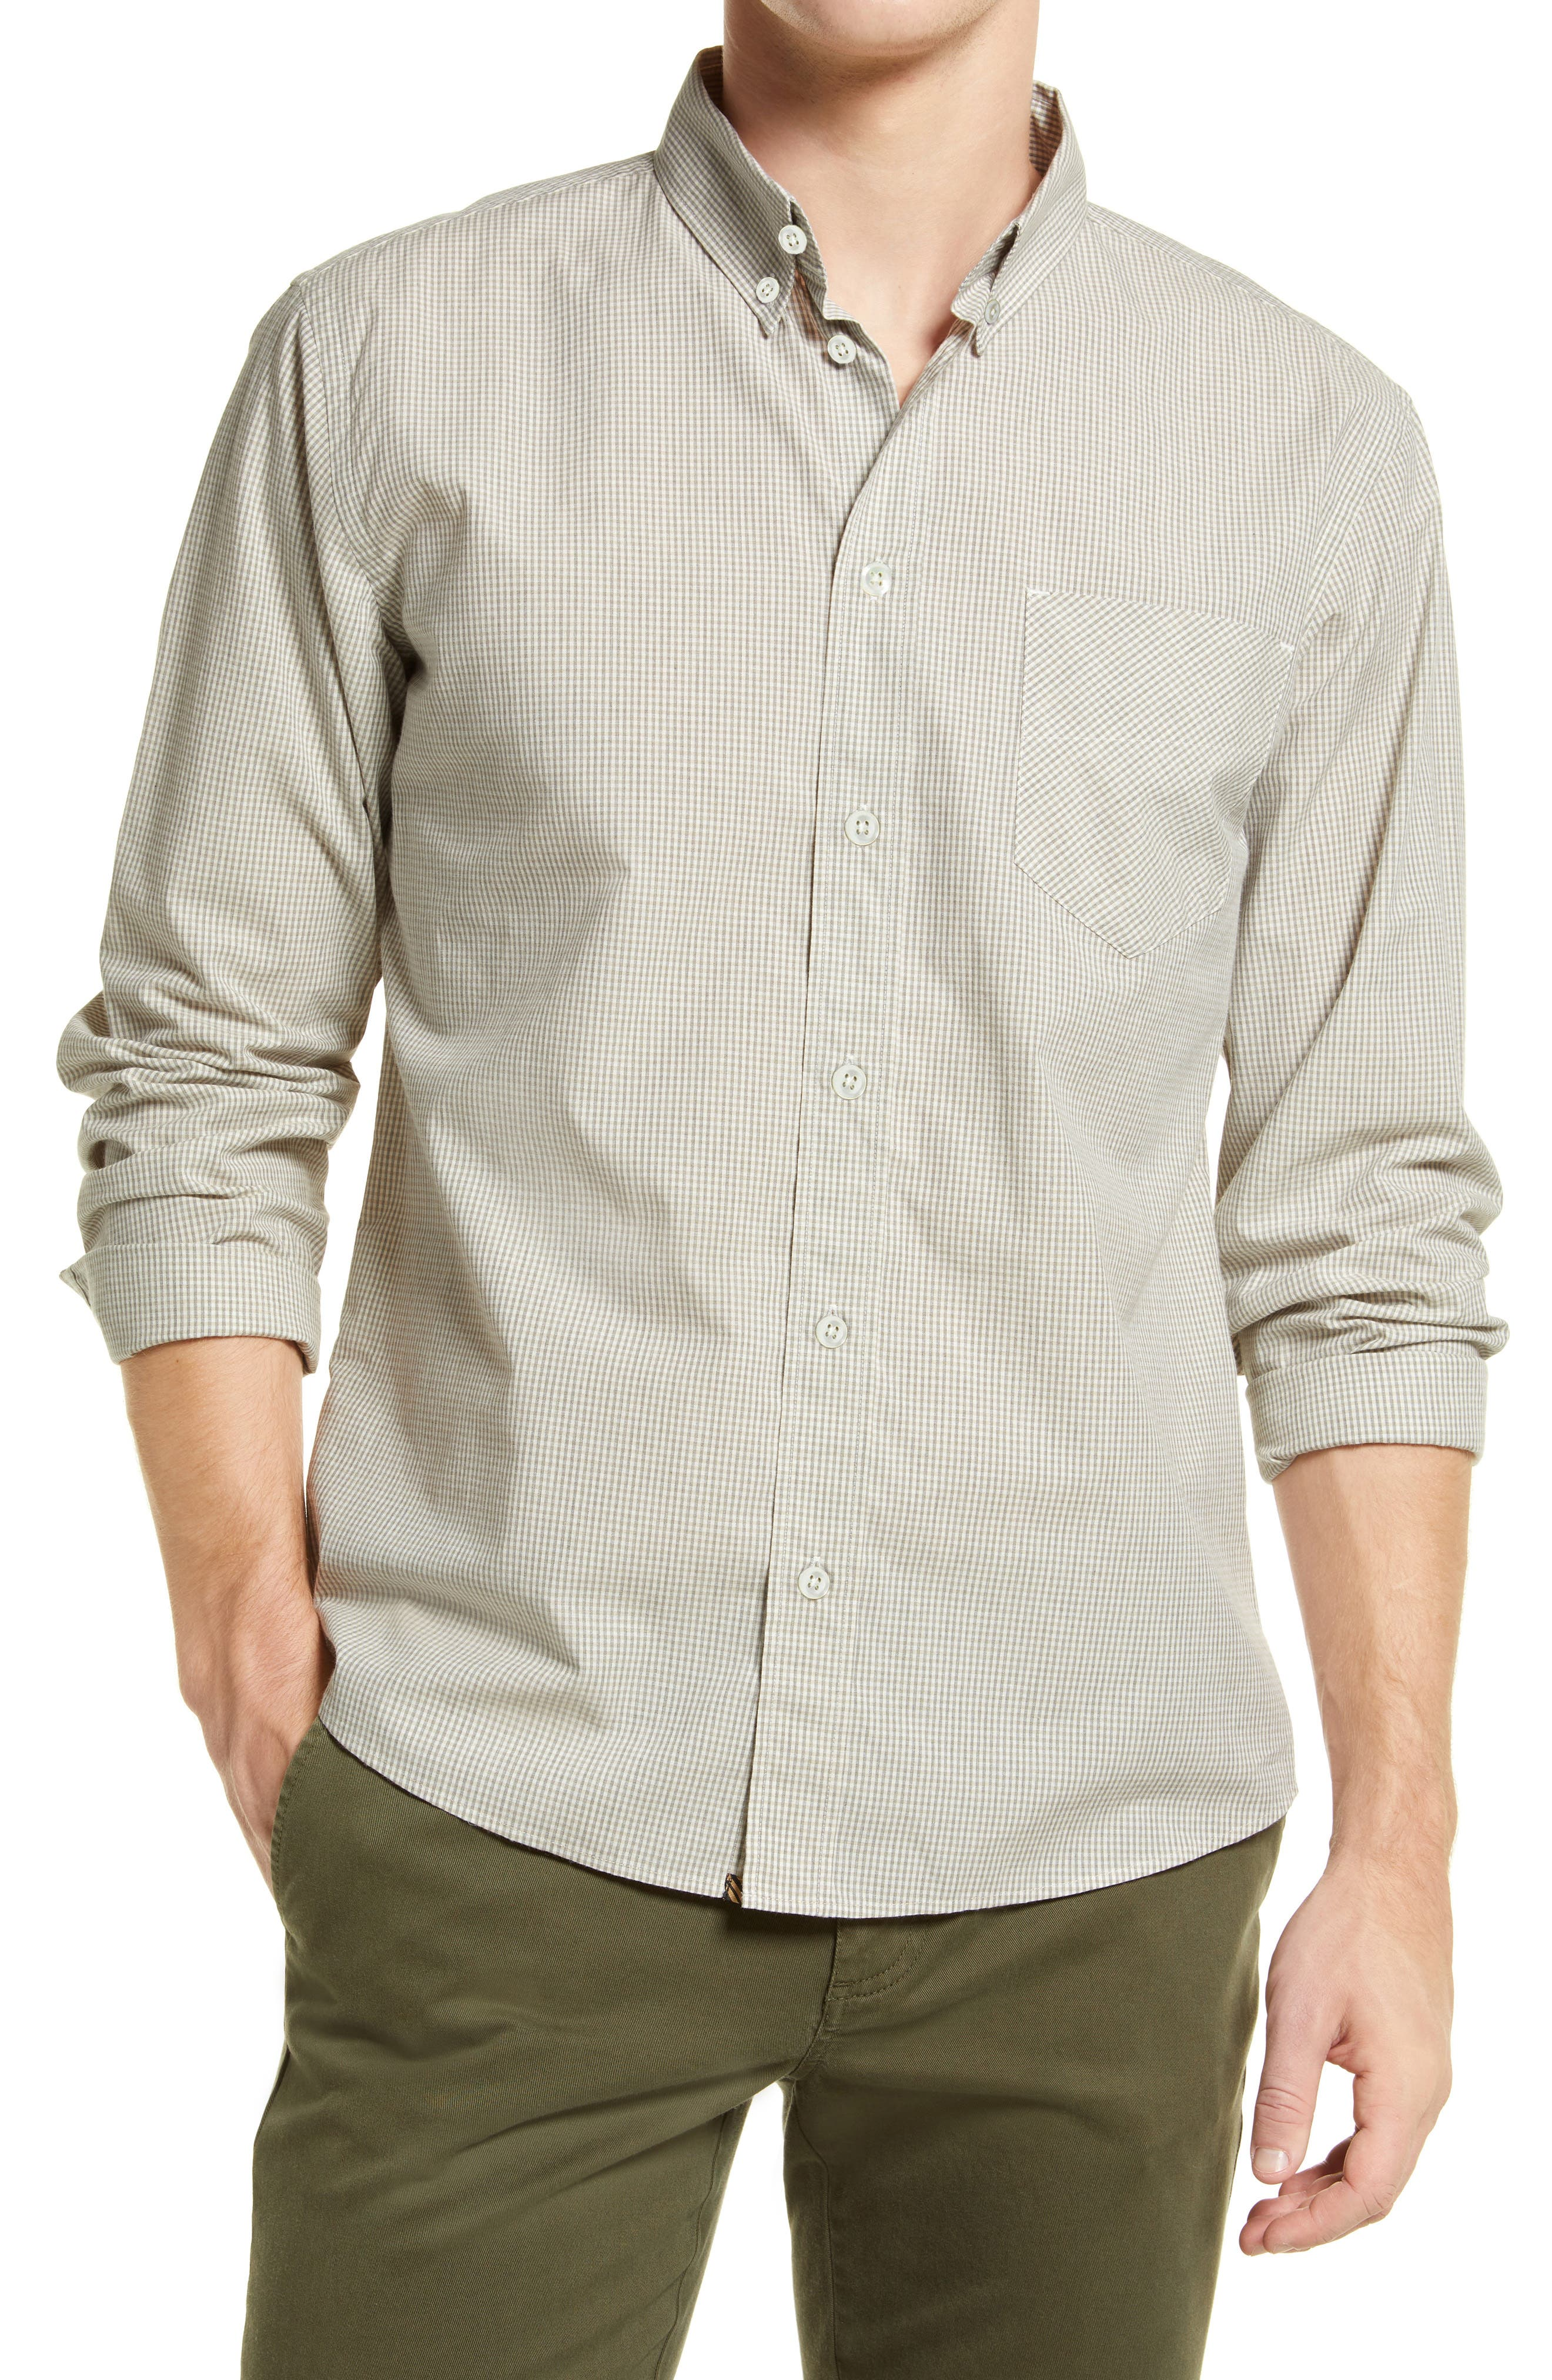 Tuscumbia Standard Fit Microcheck Button-Down Shirt